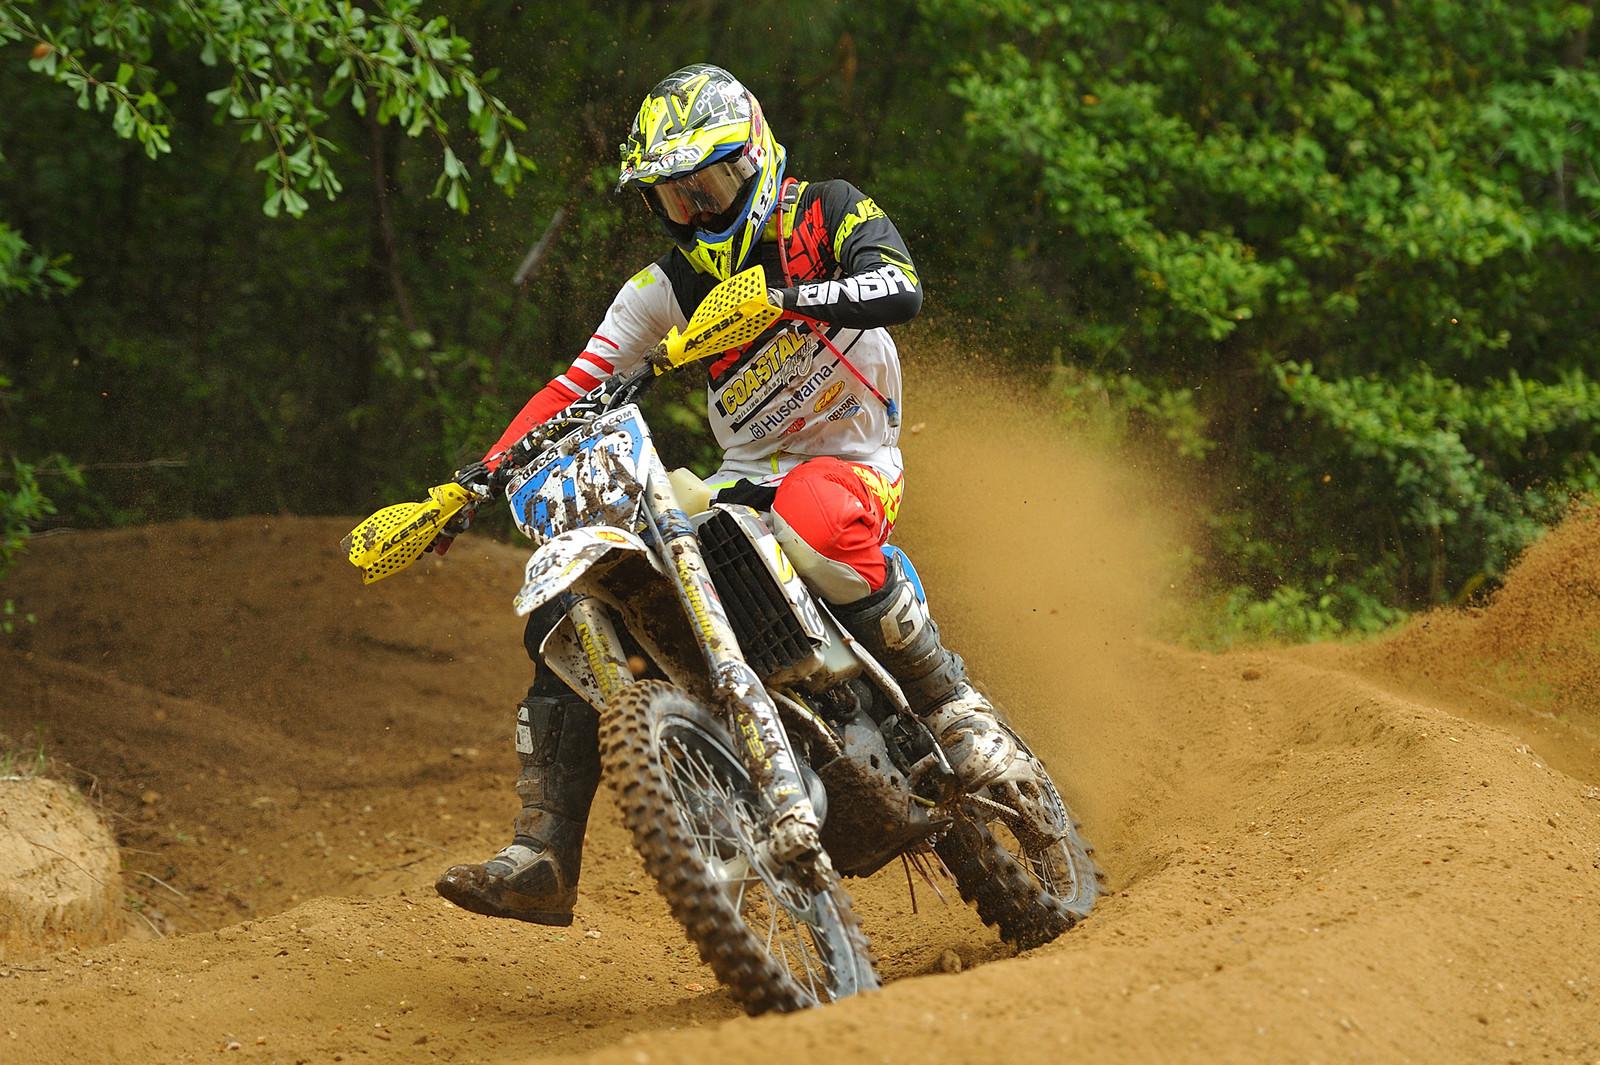 Jack Edmondson - GuyB - Motocross Pictures - Vital MX